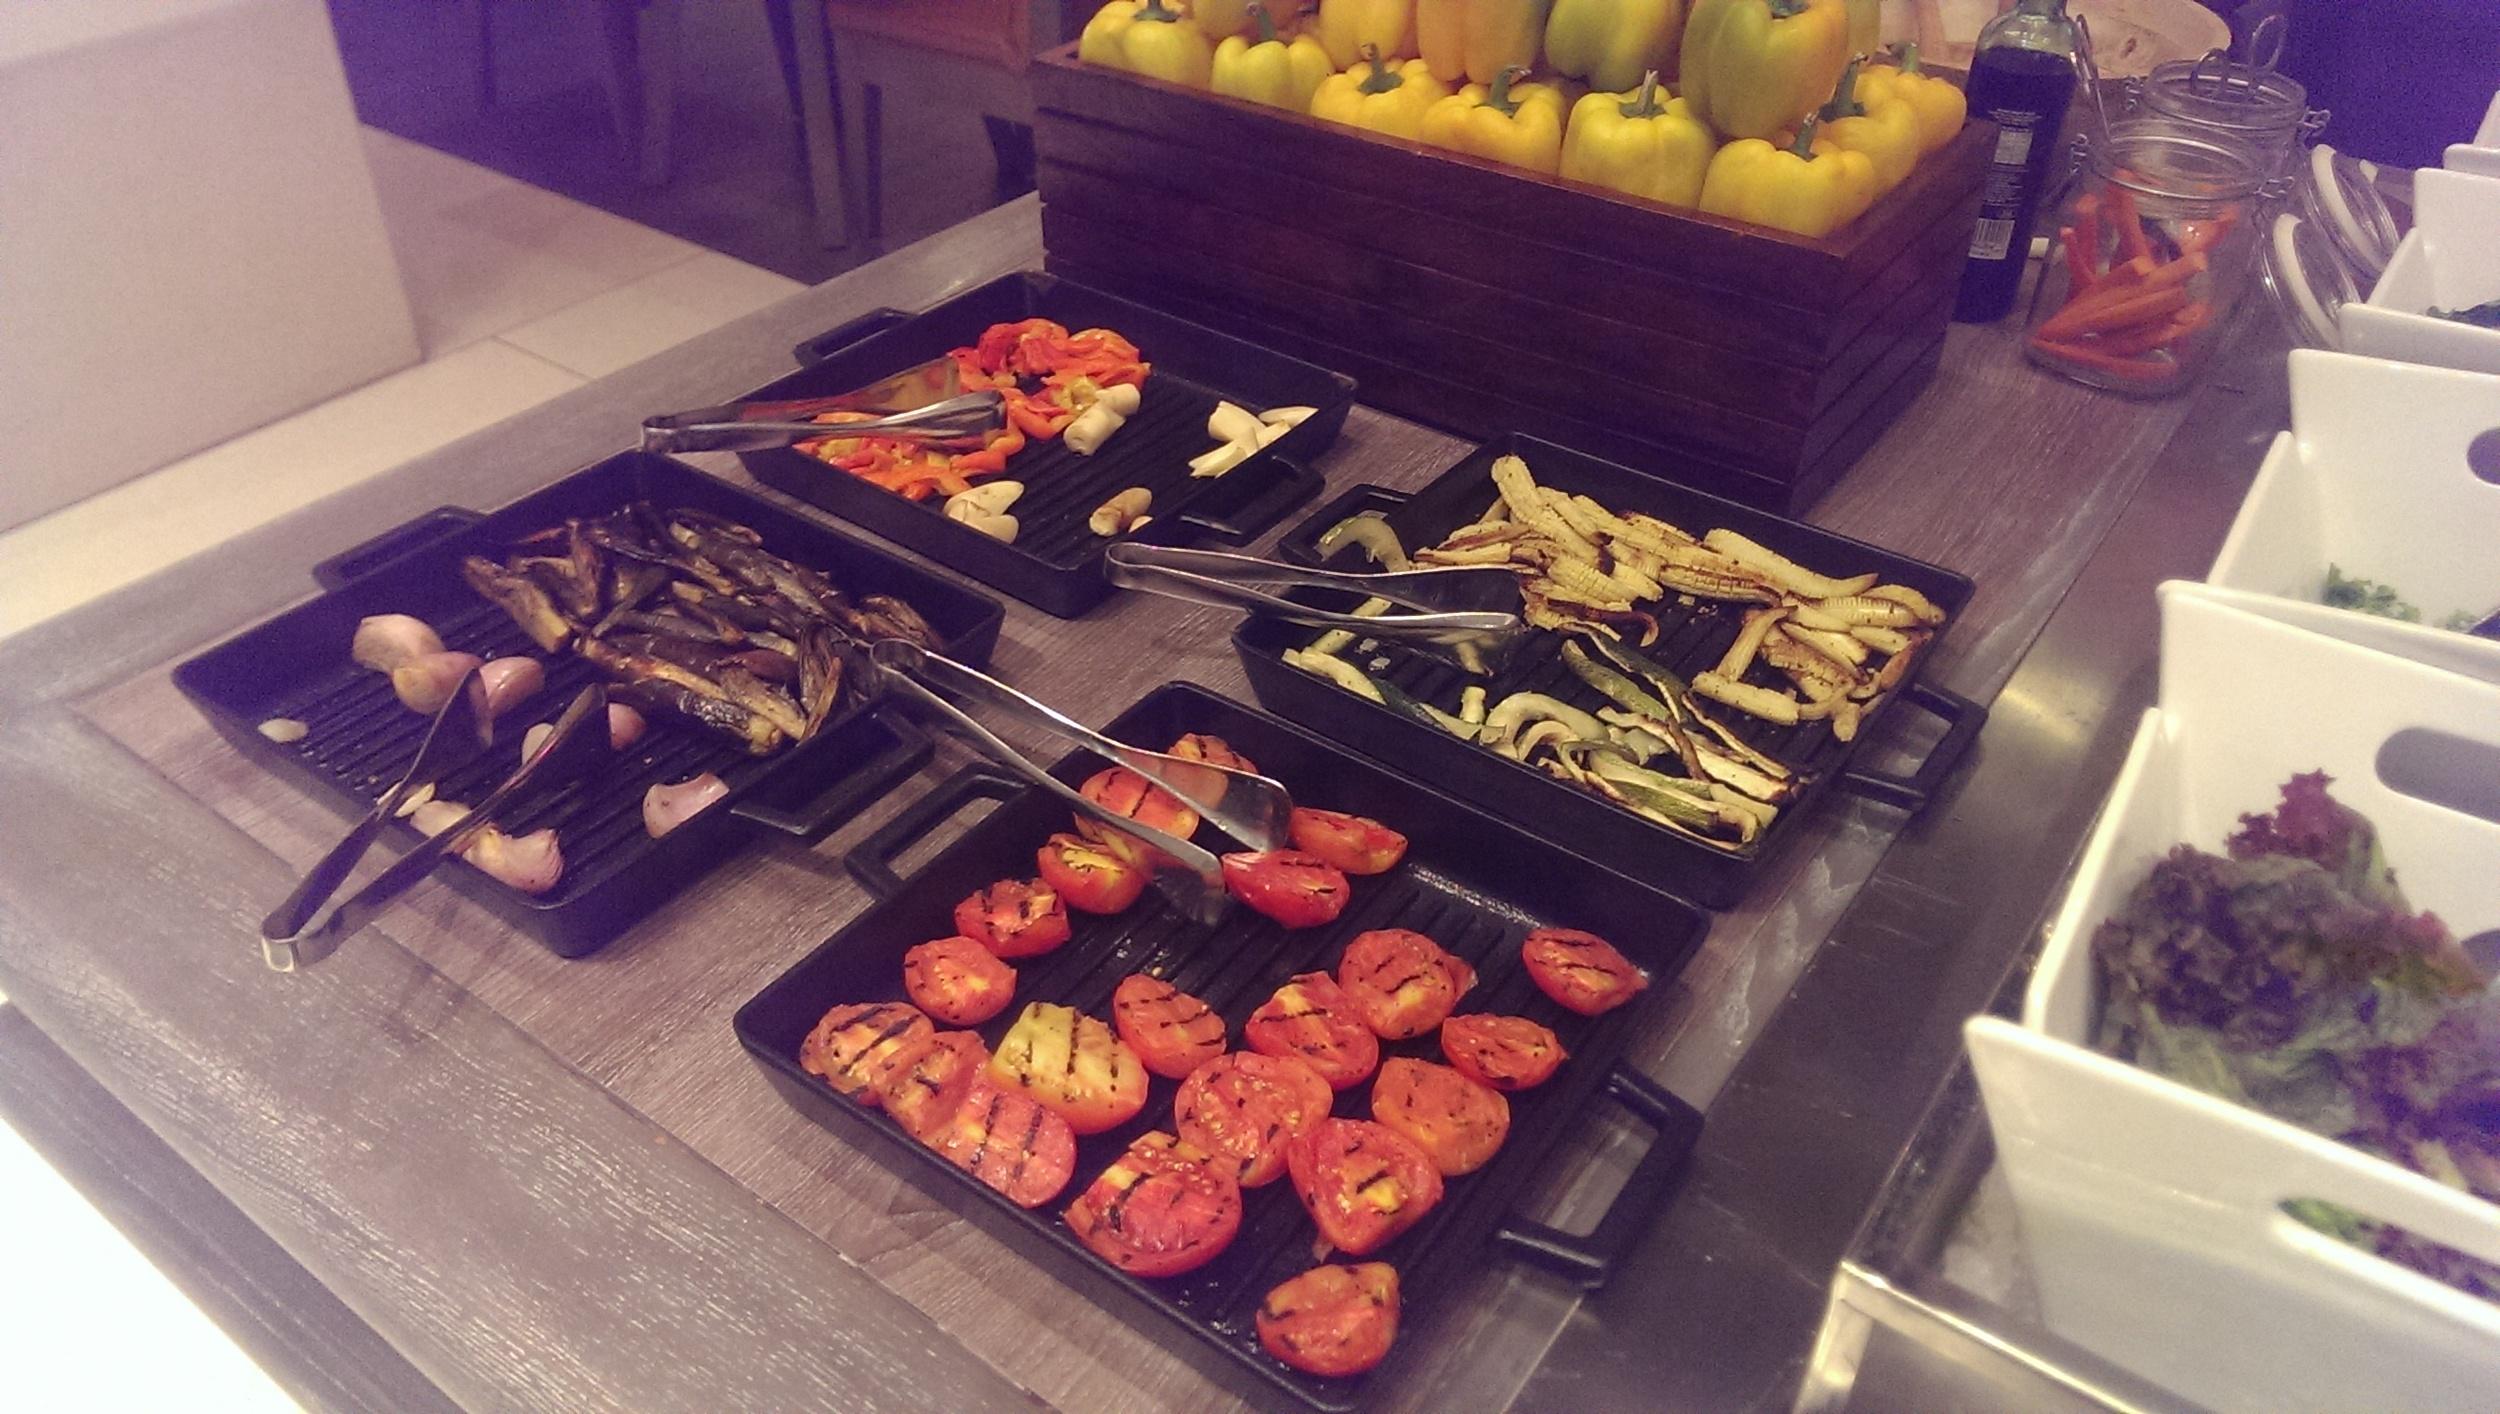 Grilled Veggies to mix into your salad @ JW Cafe, JW Sahar